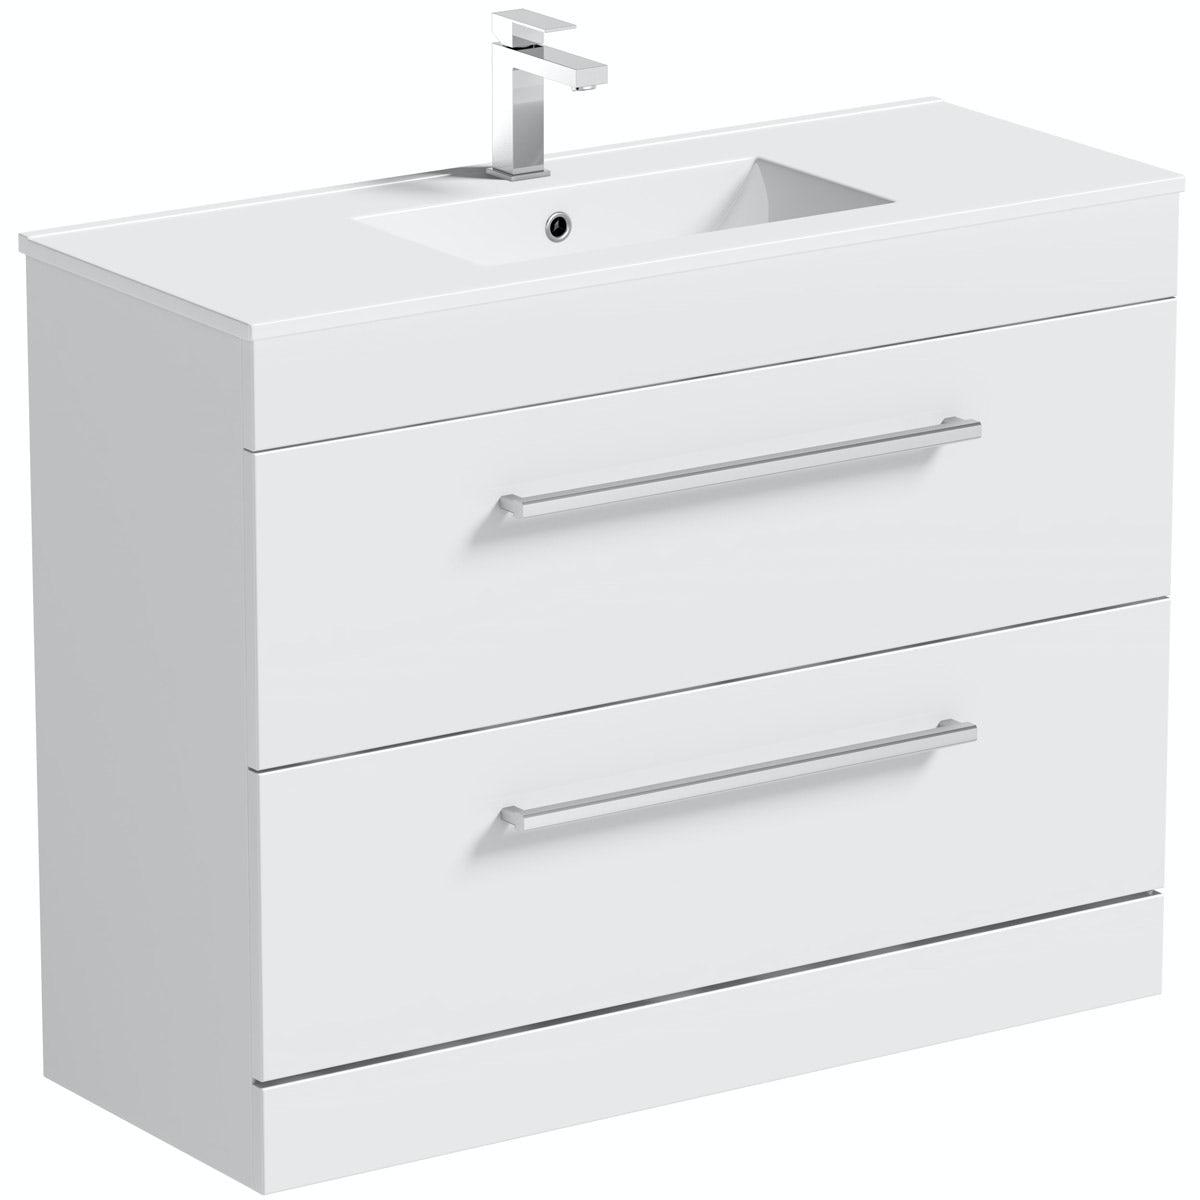 Chamonix white floor drawer vanity unit with basin 900mm